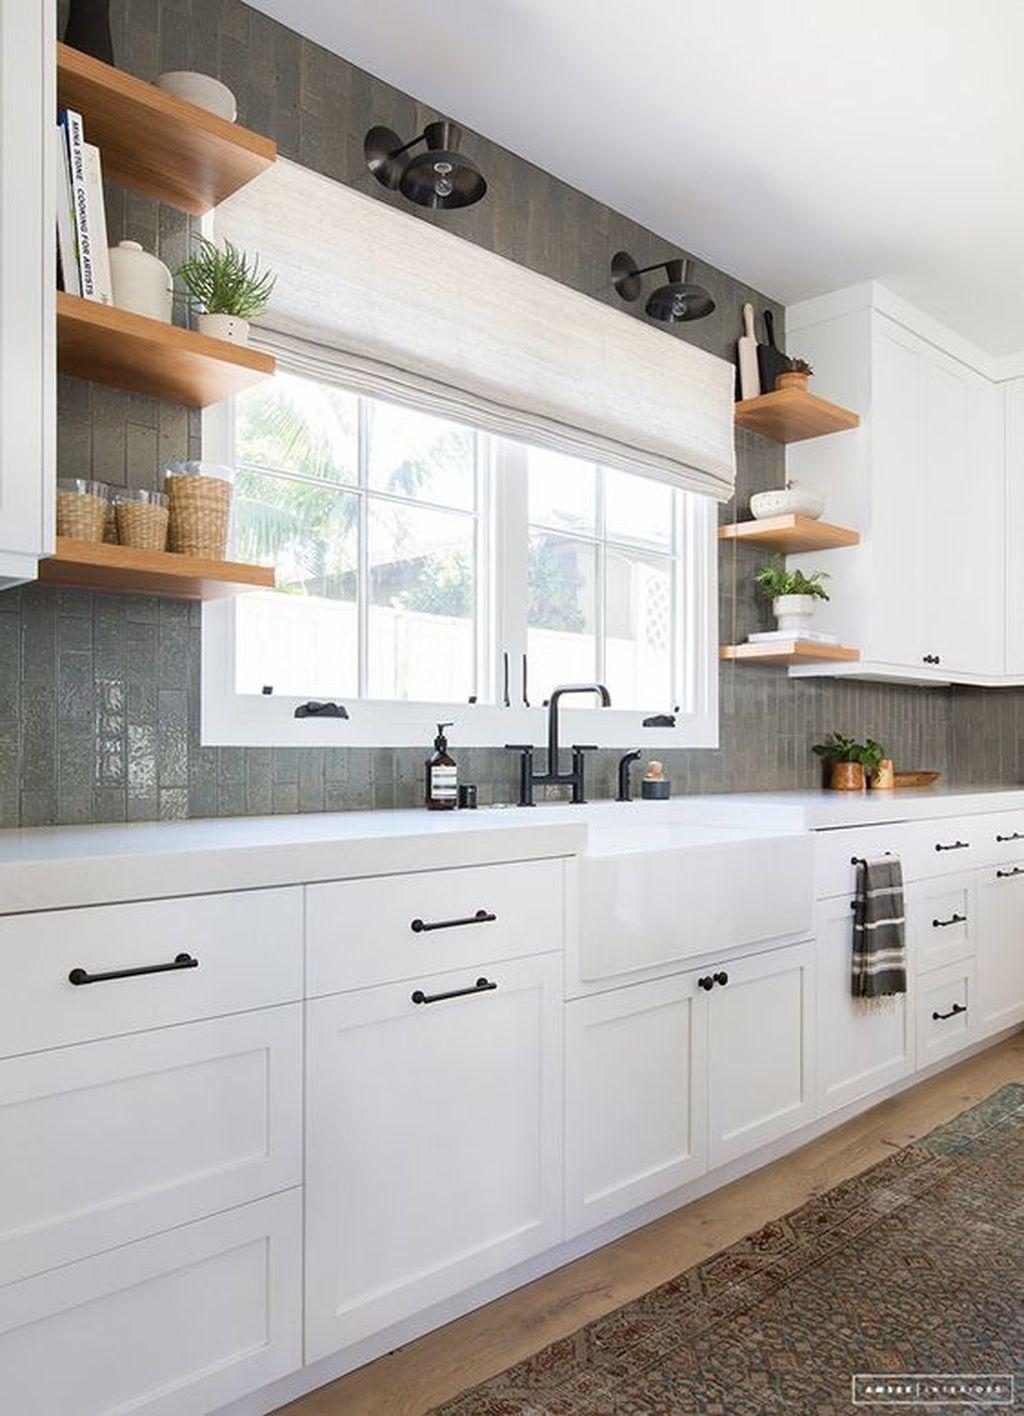 Brilliant Small Kitchen Remodel Design Ideas On A Budget 27